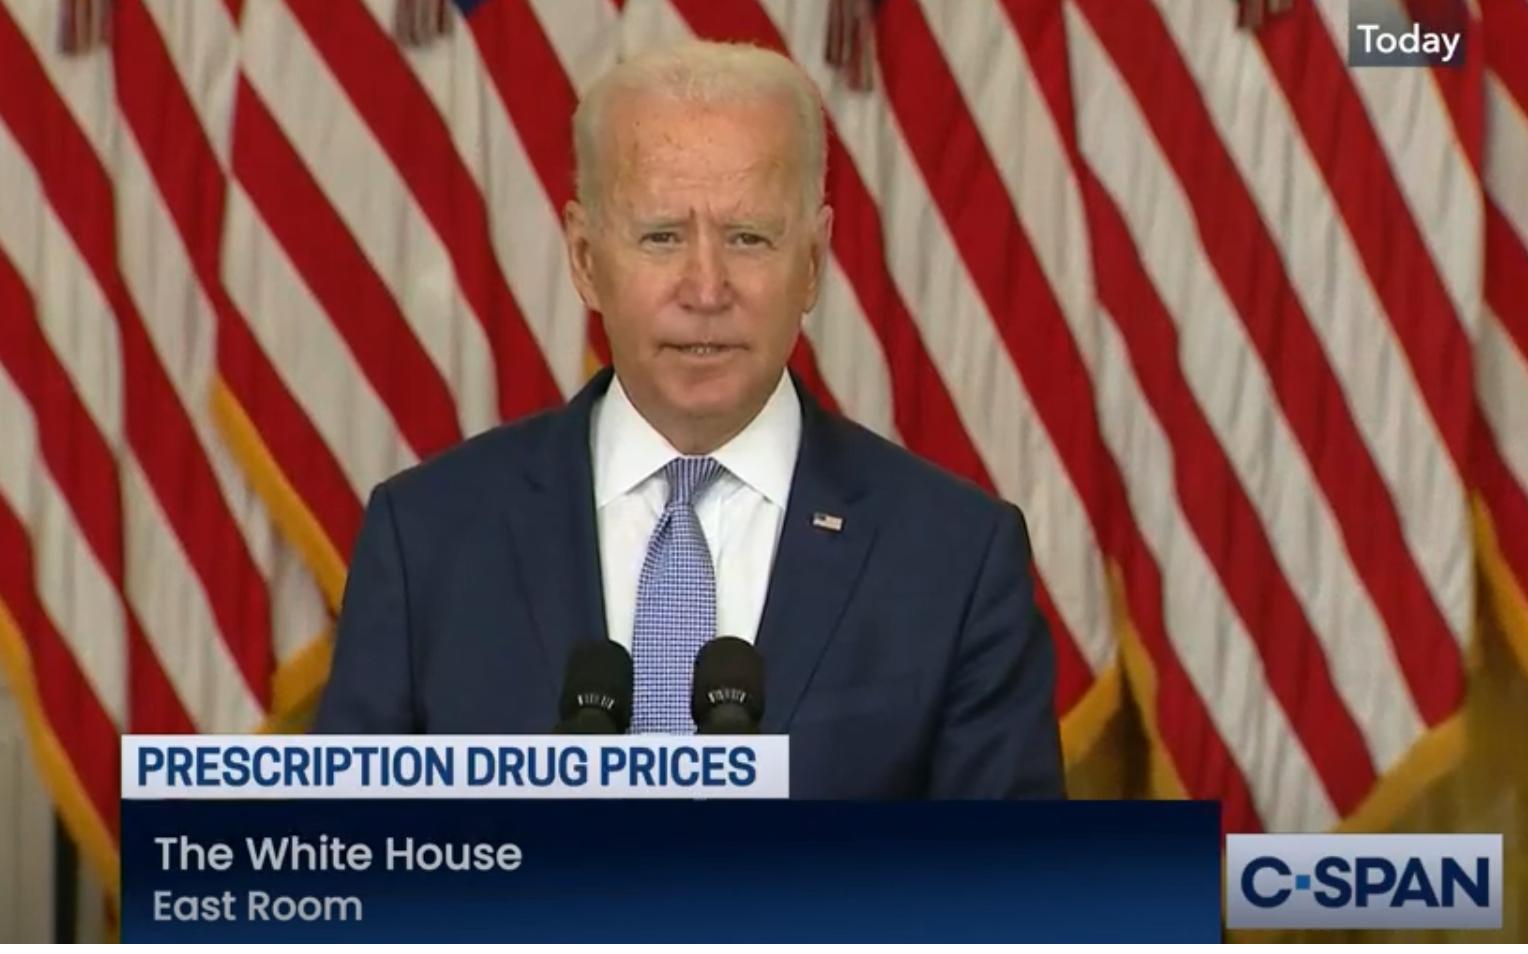 Pharma's Revolving Door Jeopardizes Biden's Promise To Lower Drug Costs